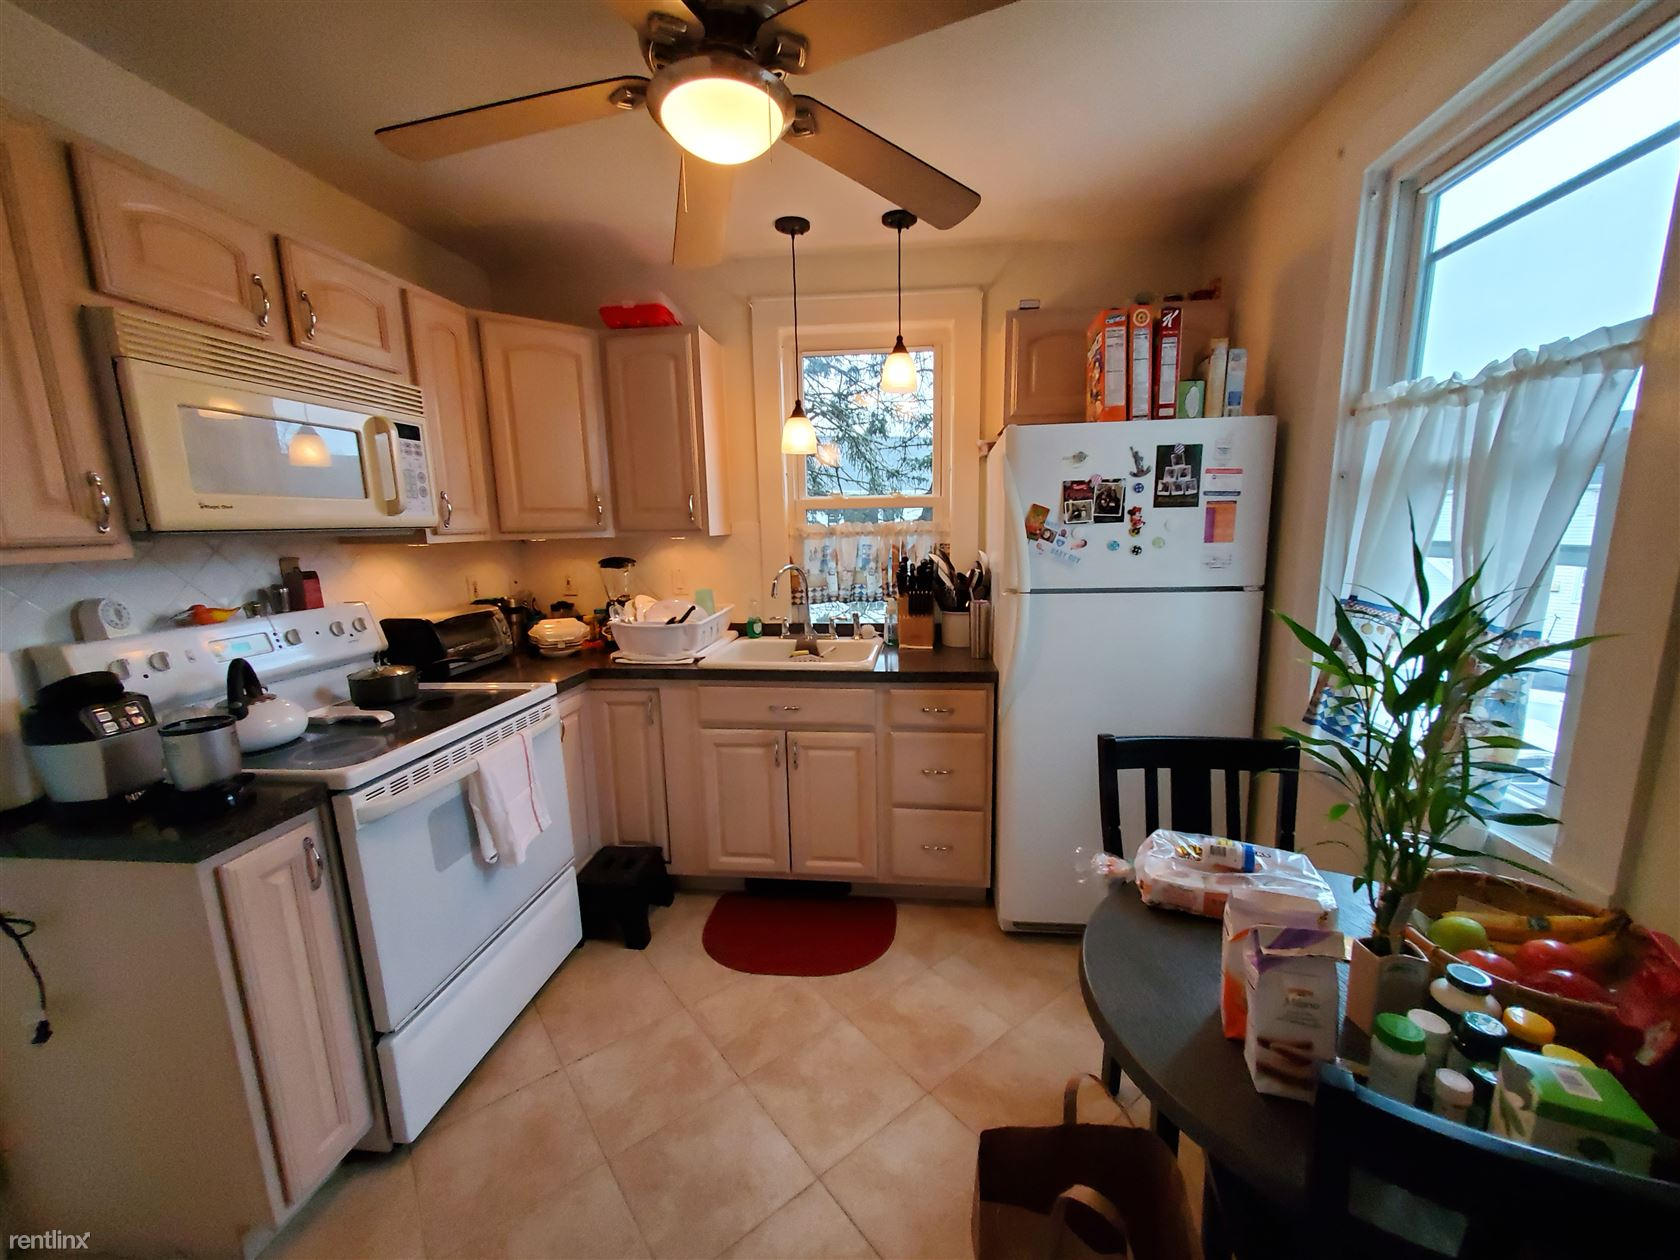 Saugatuck Ave., Westport, CT - $1,500